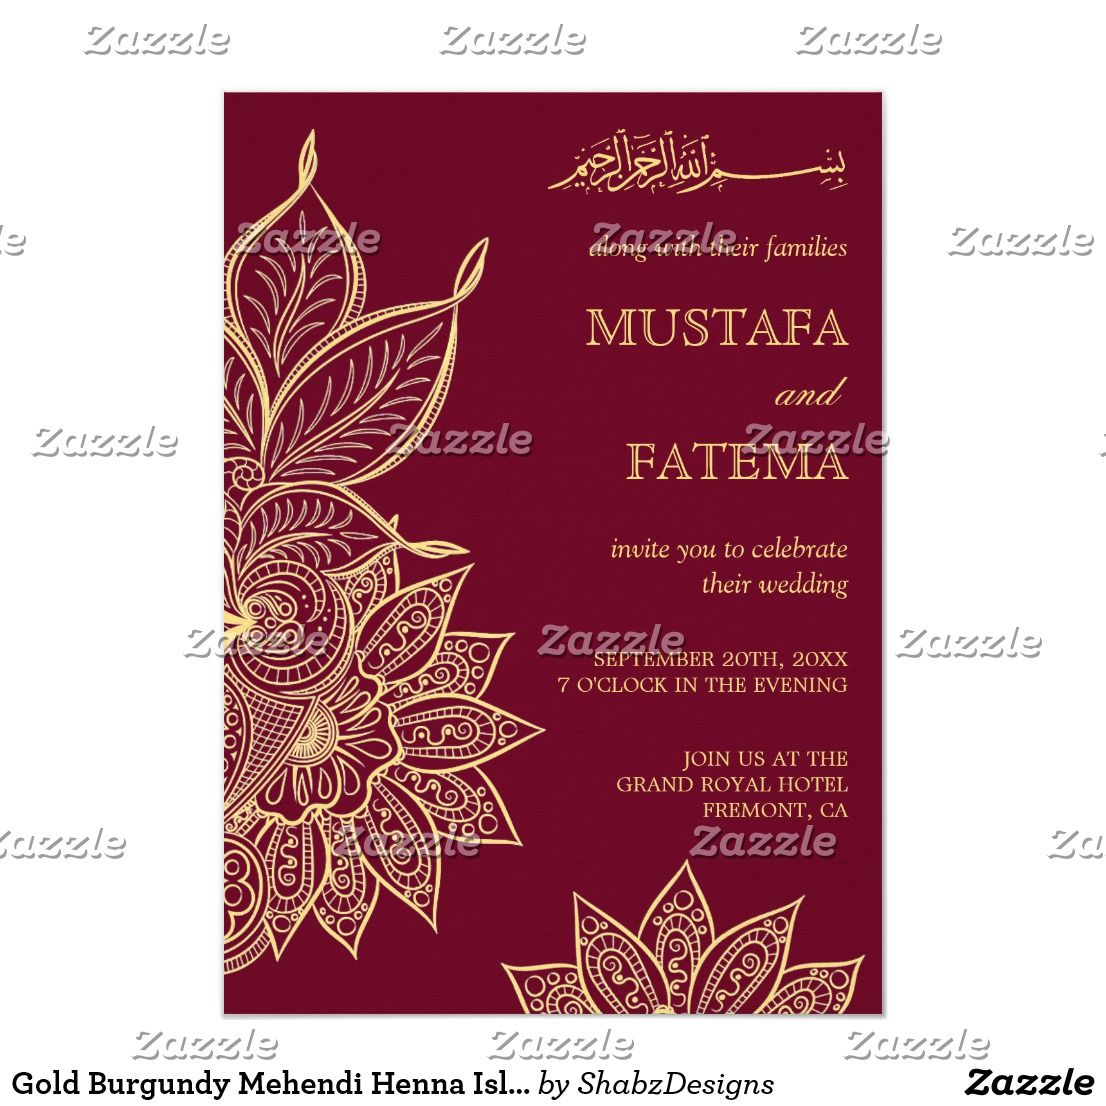 Gold Burgundy Mehendi Henna Islamic Wedding Invitation